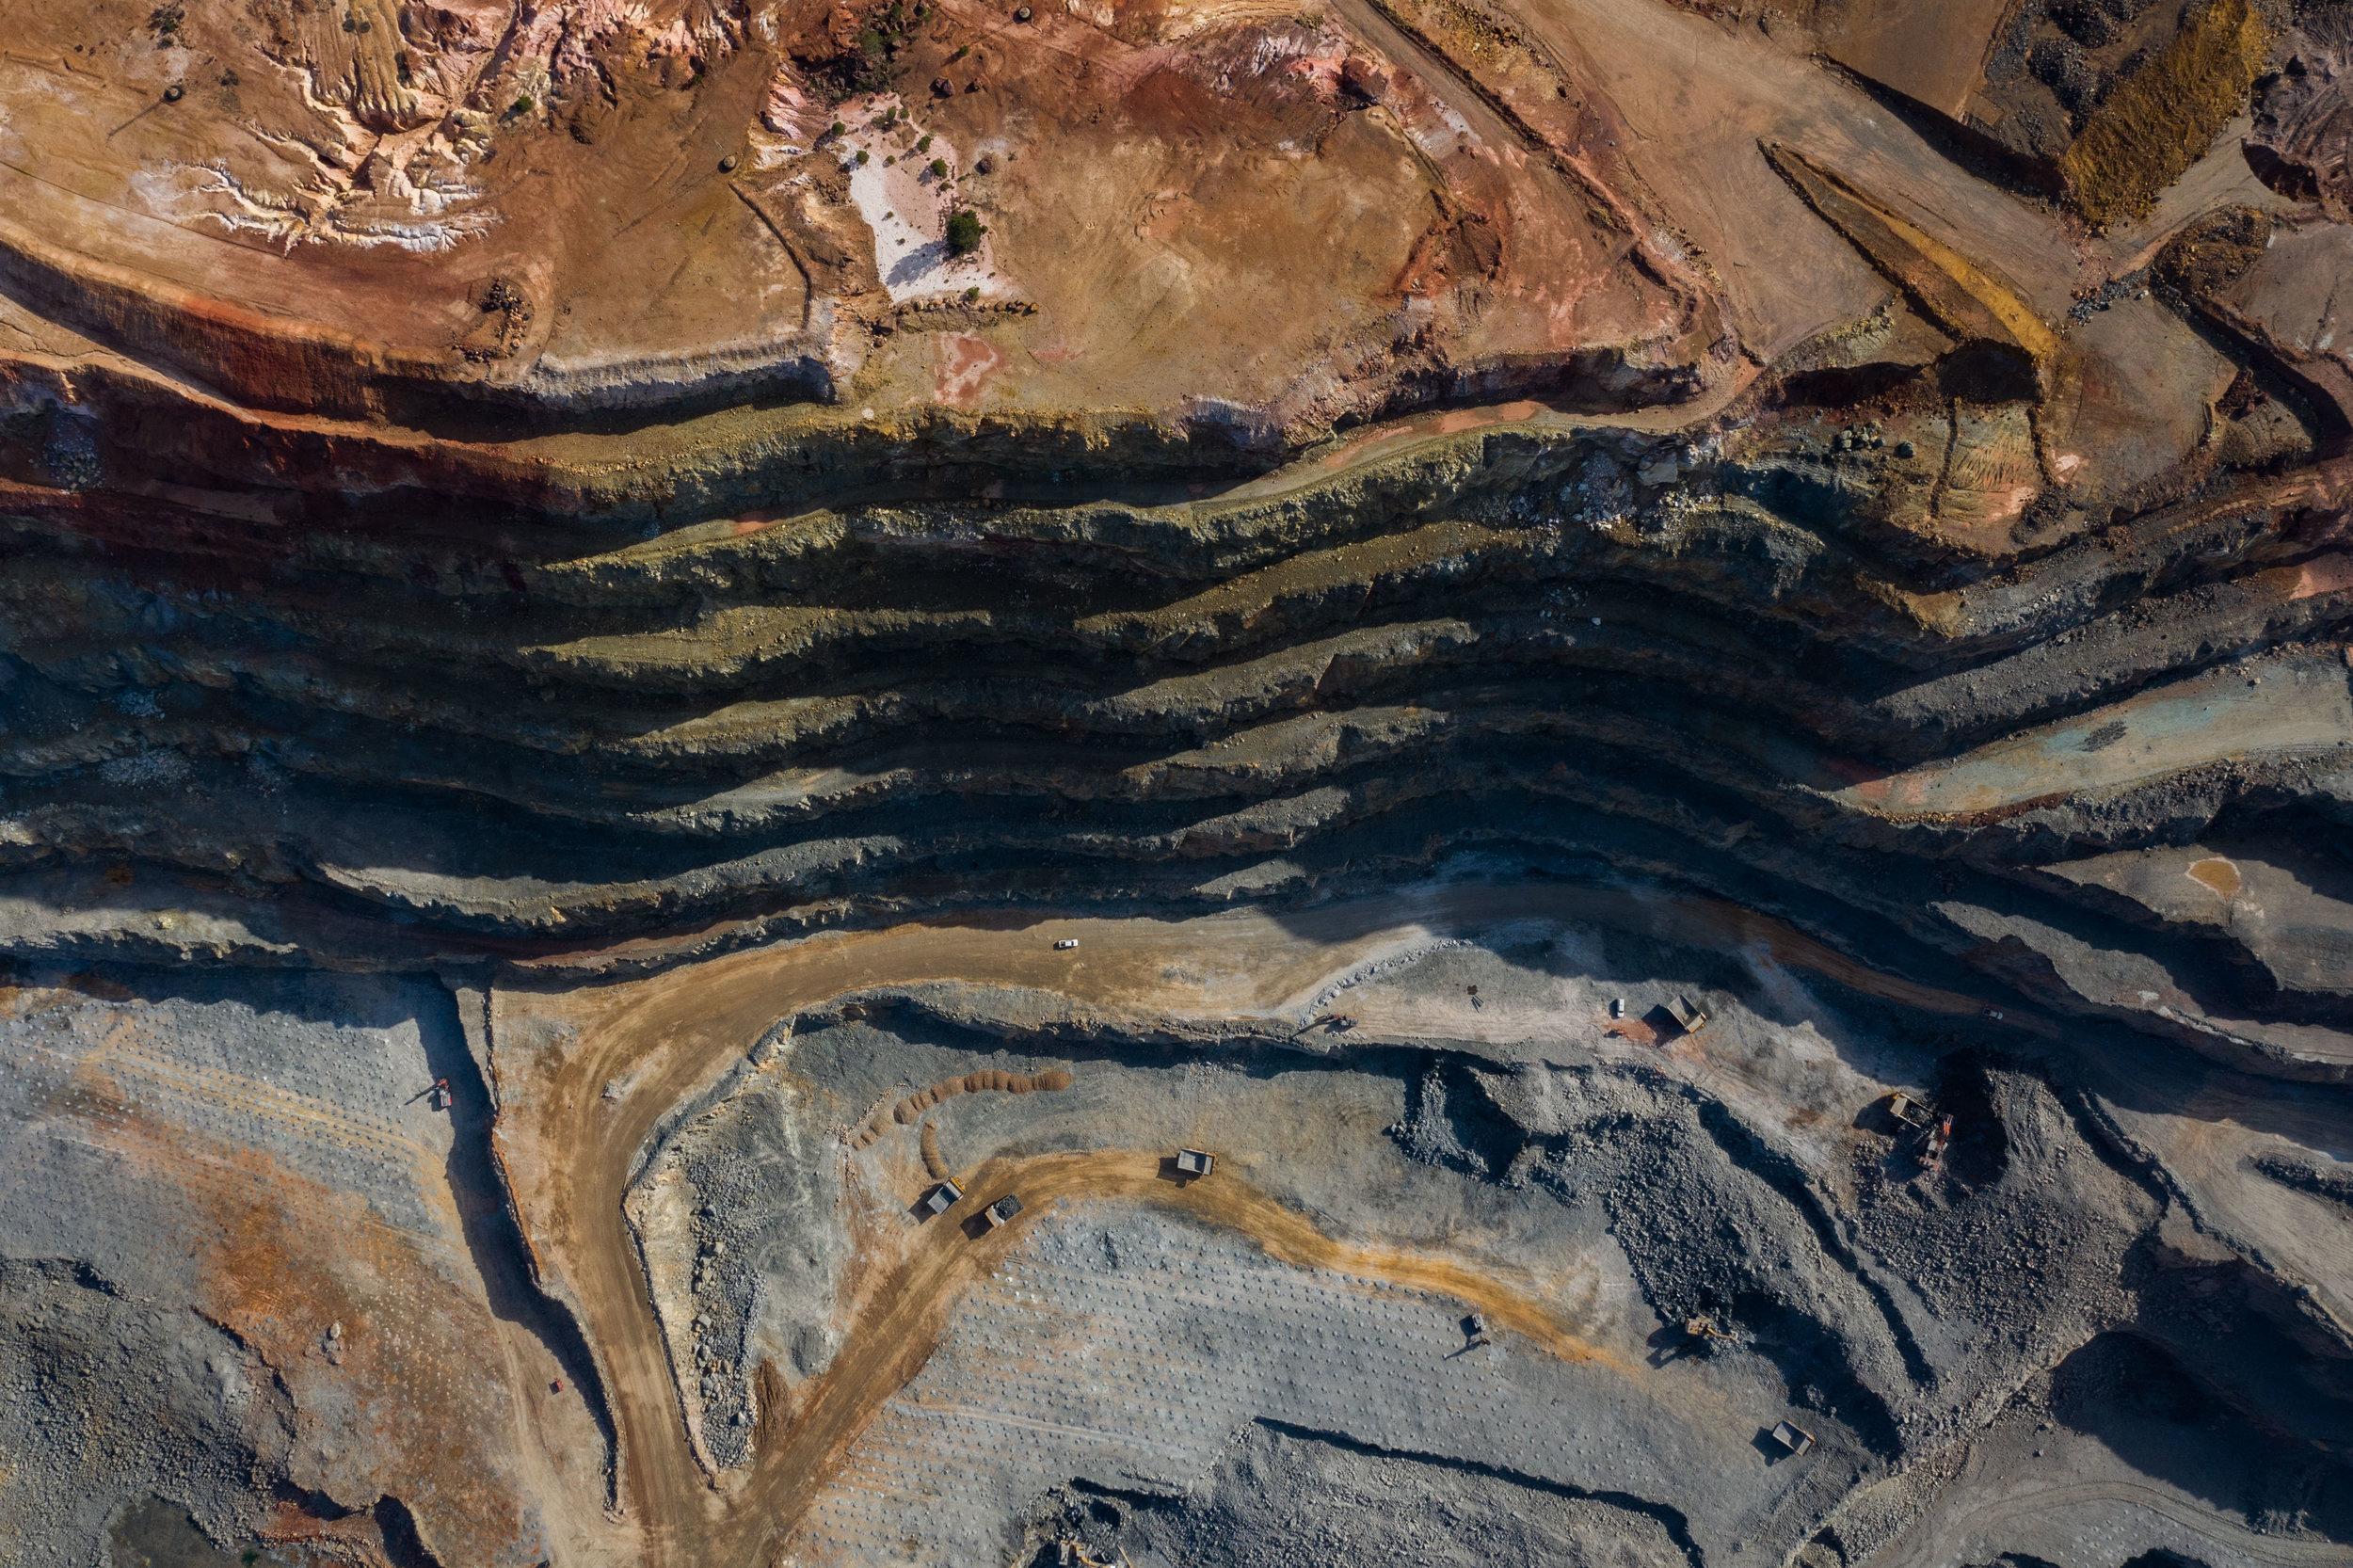 Proyecto Riotinto mine, Seville, Spain